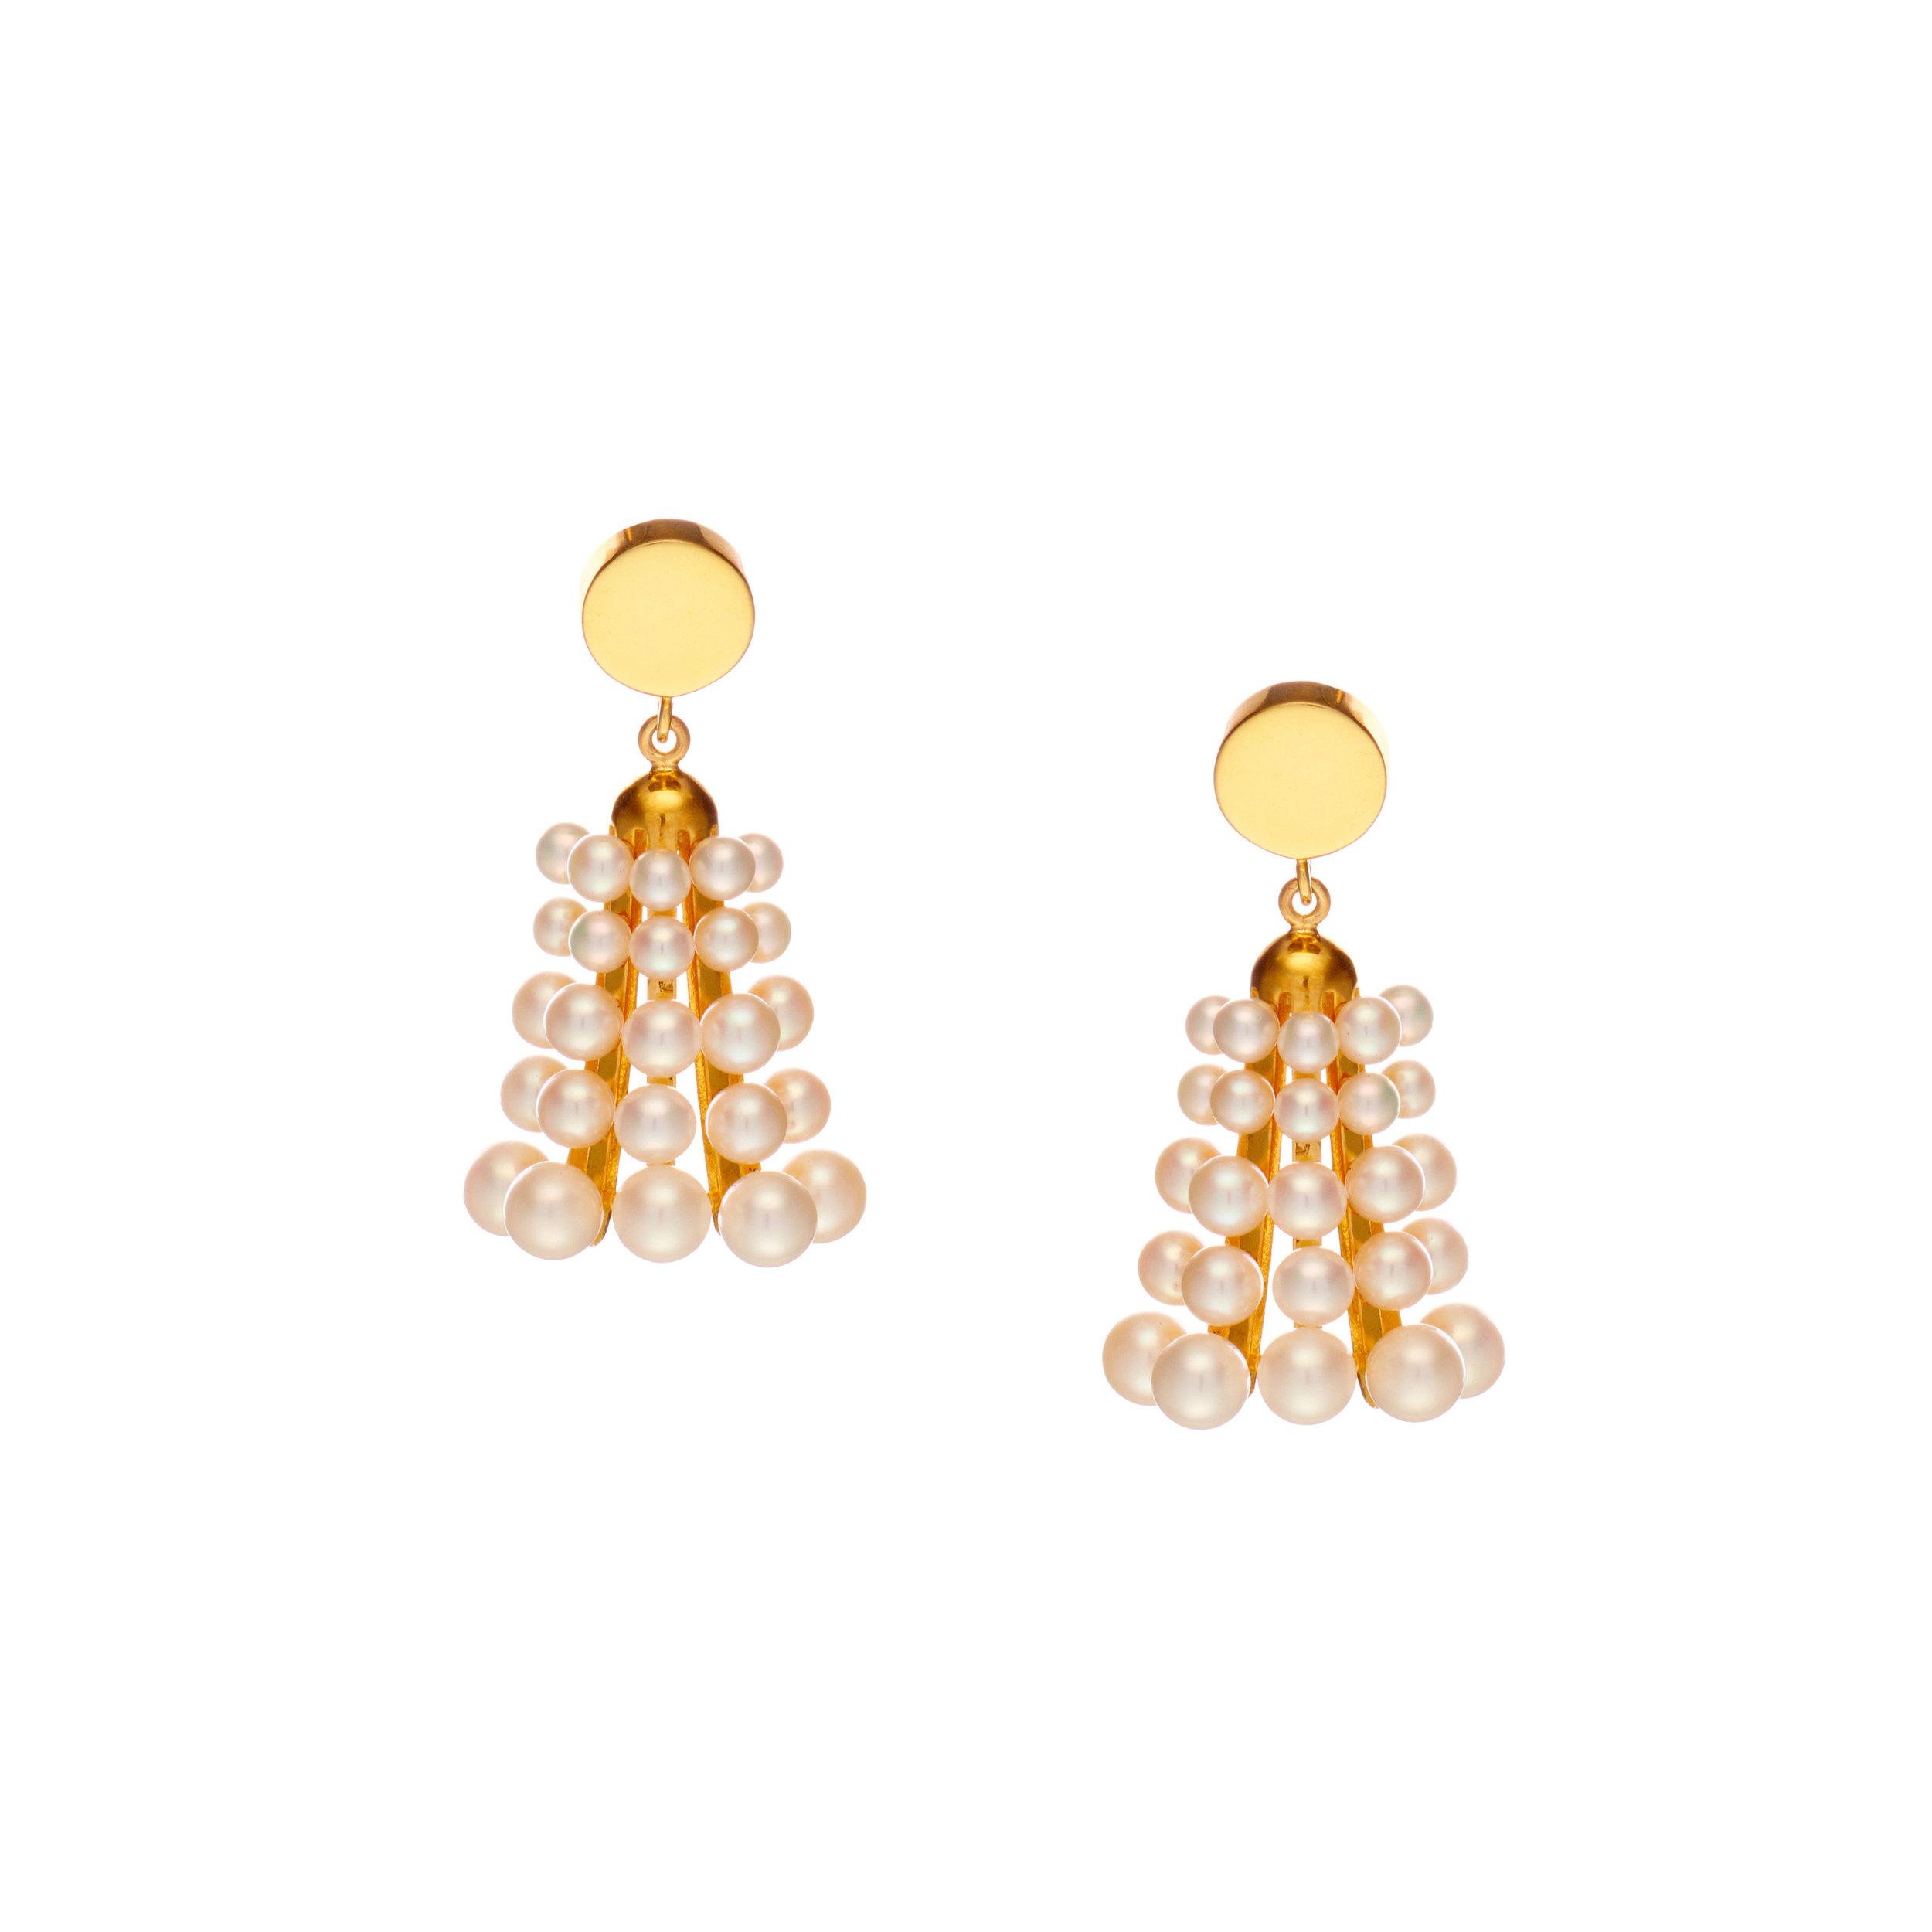 Carillon II - Earrings